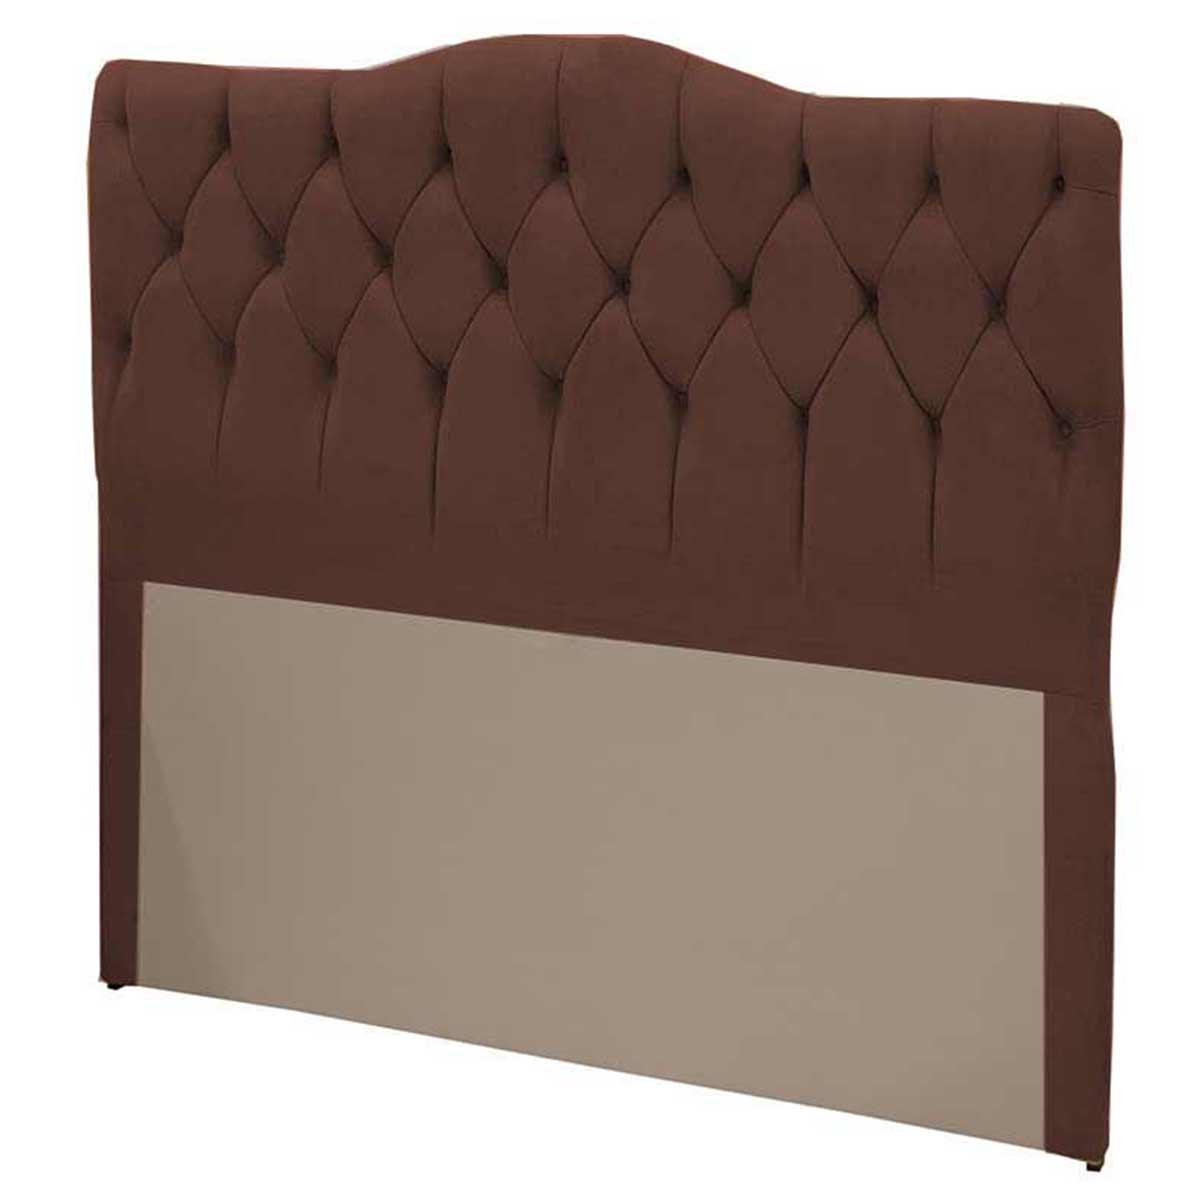 Cabeceira Casal Estofada Luxury 140cm Suede Chocolate Simbal